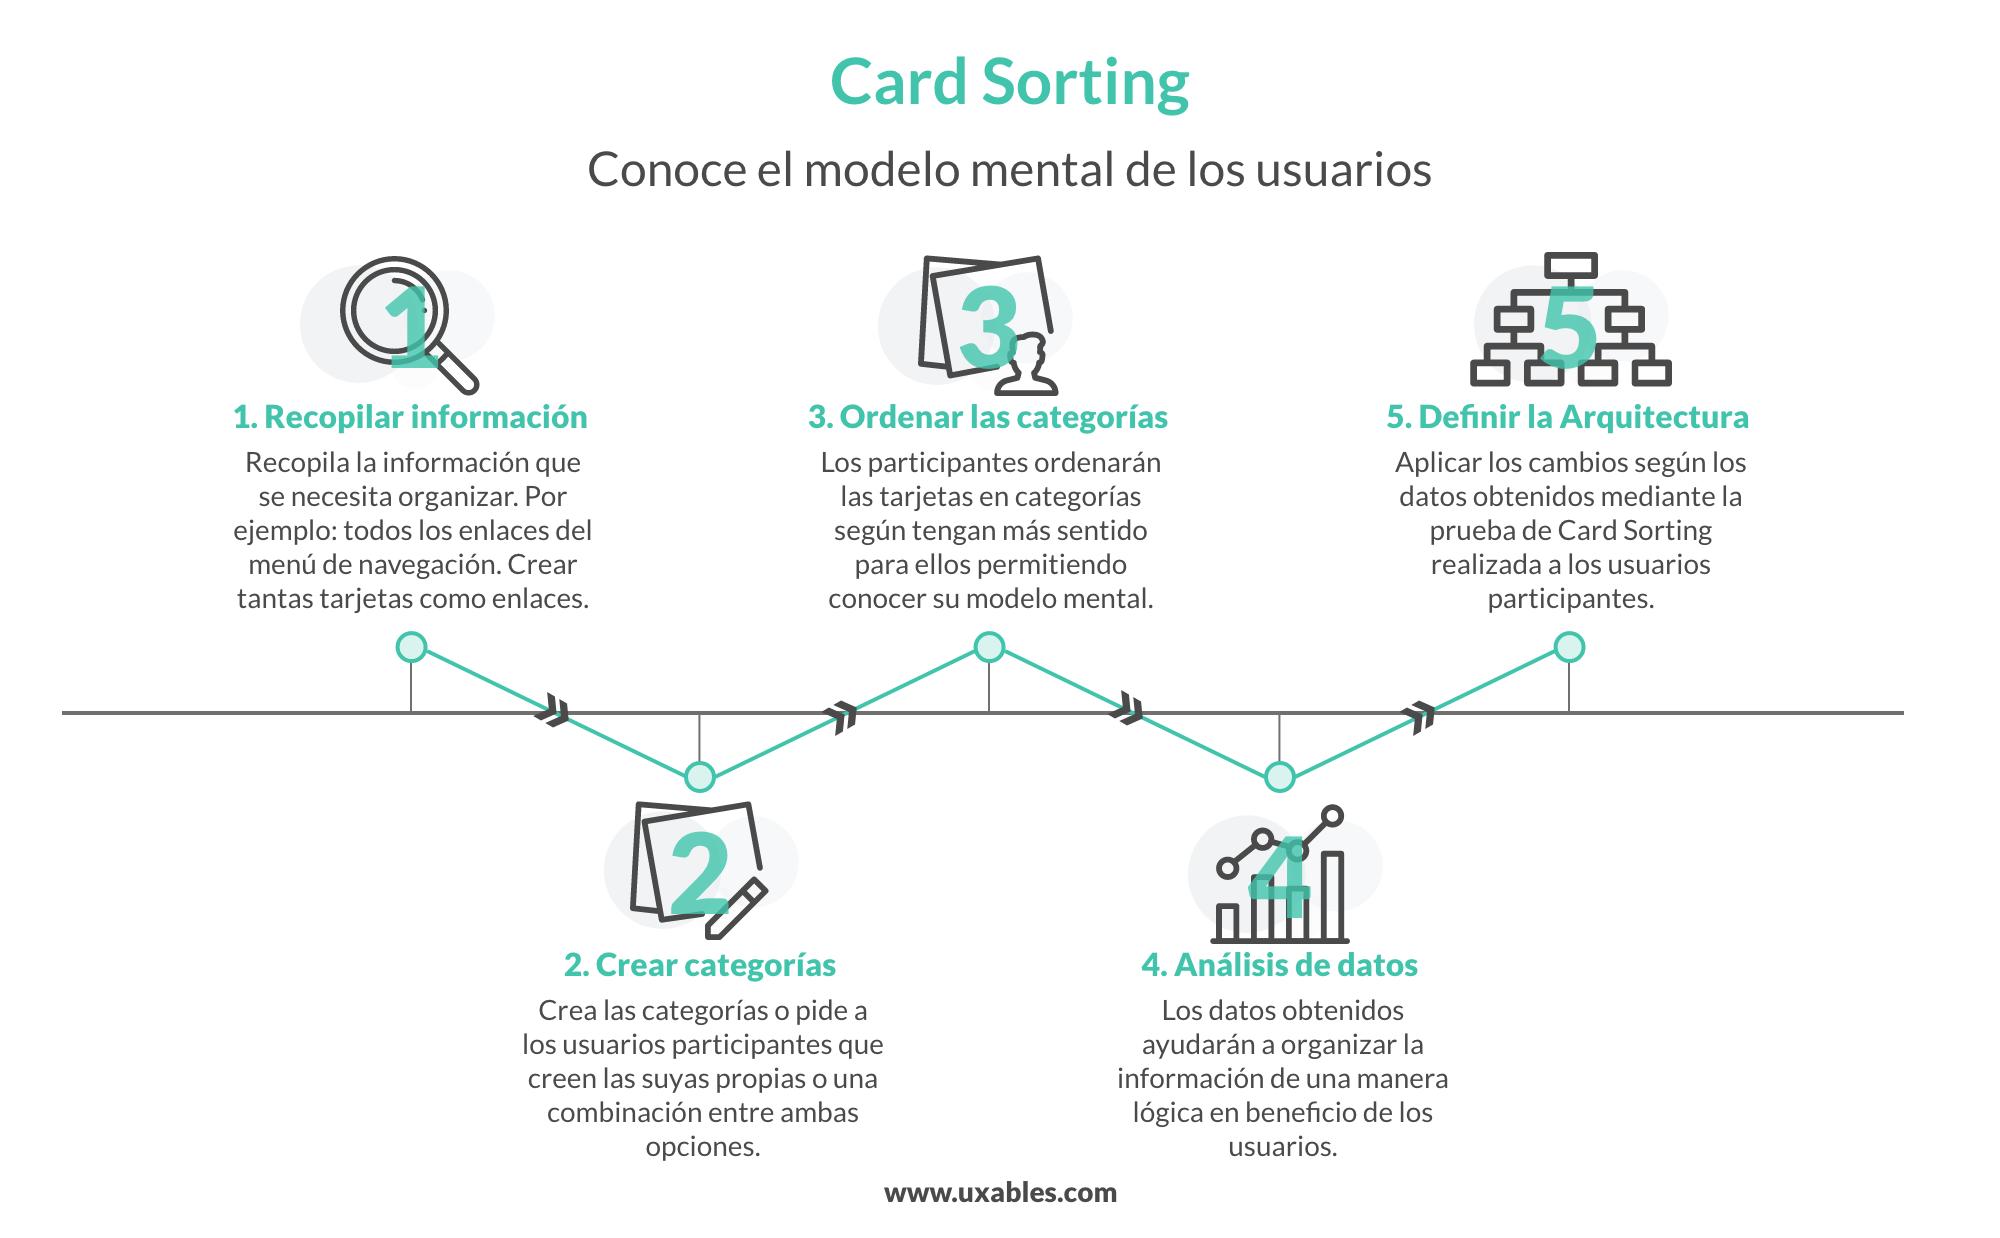 inforgrafia card sorting, card sorting, usablidad, ux, experiencia de usuario,